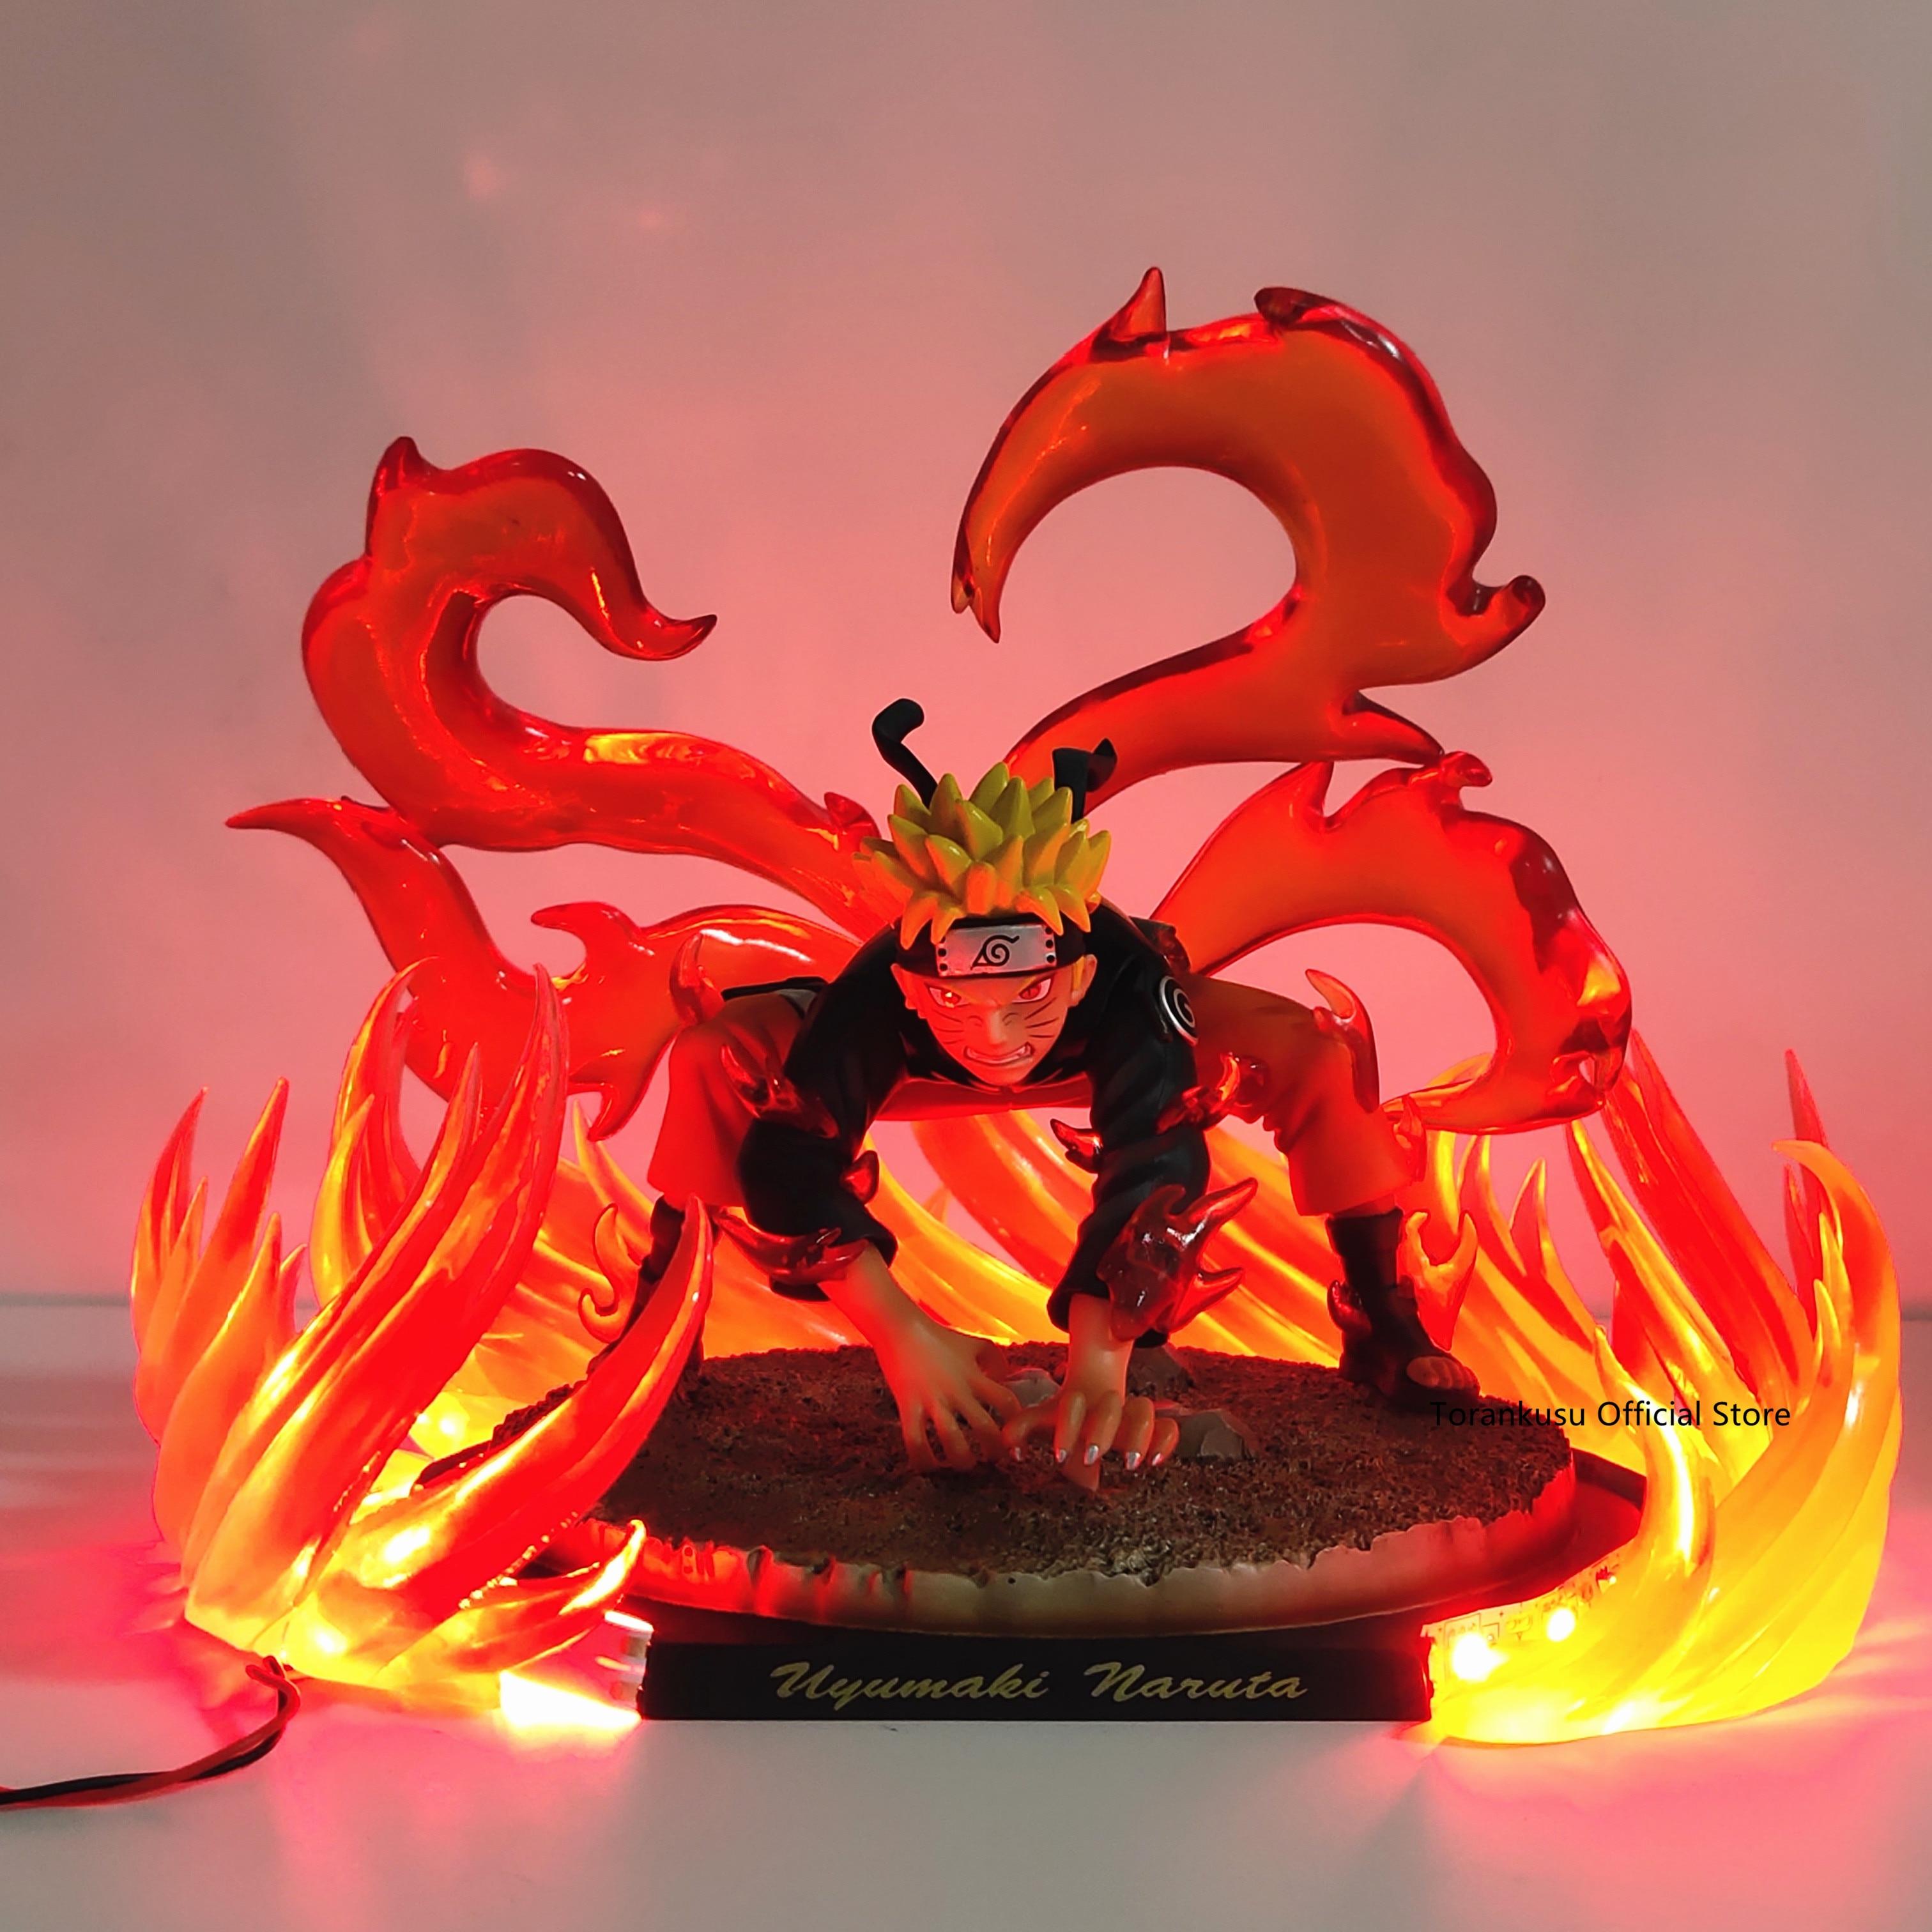 Naruto Kyuubi Nine Tails Led Power PVC Action Figure Toy Anime Naruto Shippuden Kyuubi Led Collectible Model Figure Toys